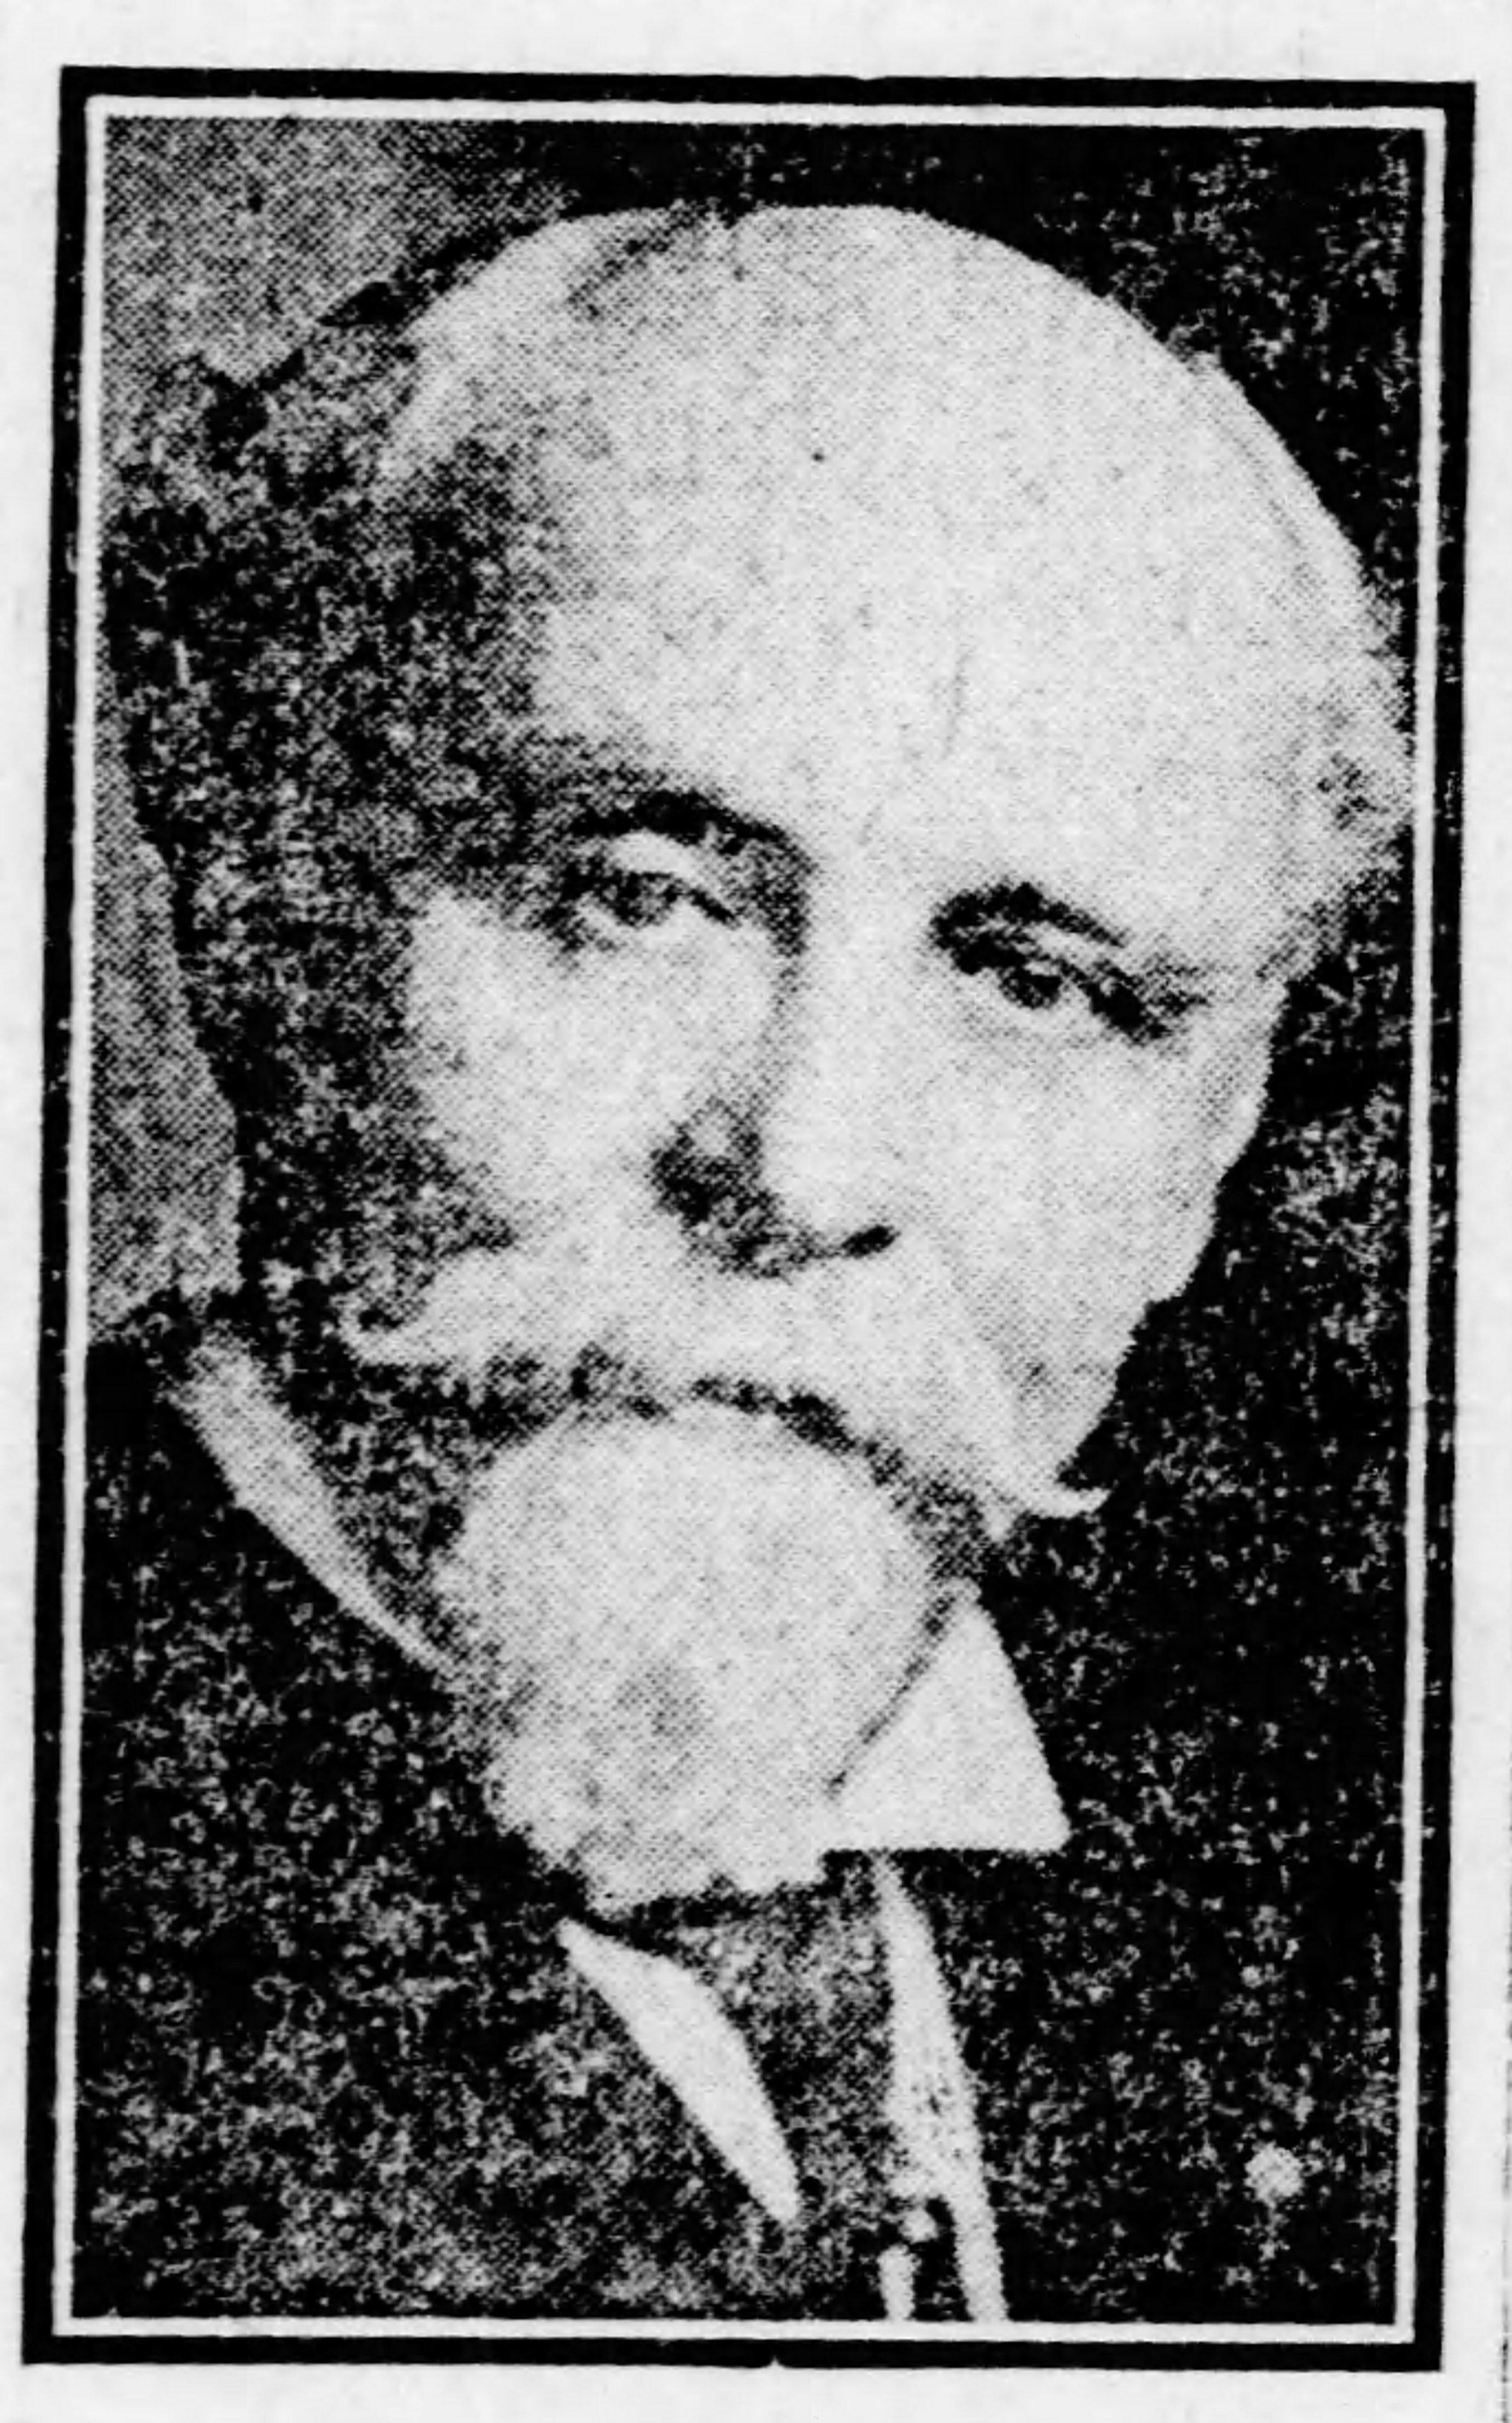 Thomas W. Irwin, The Pittsburgh Post Gazette Times, August 5, 1917 vol. 132, no. 8, sec. 2, p. 6.